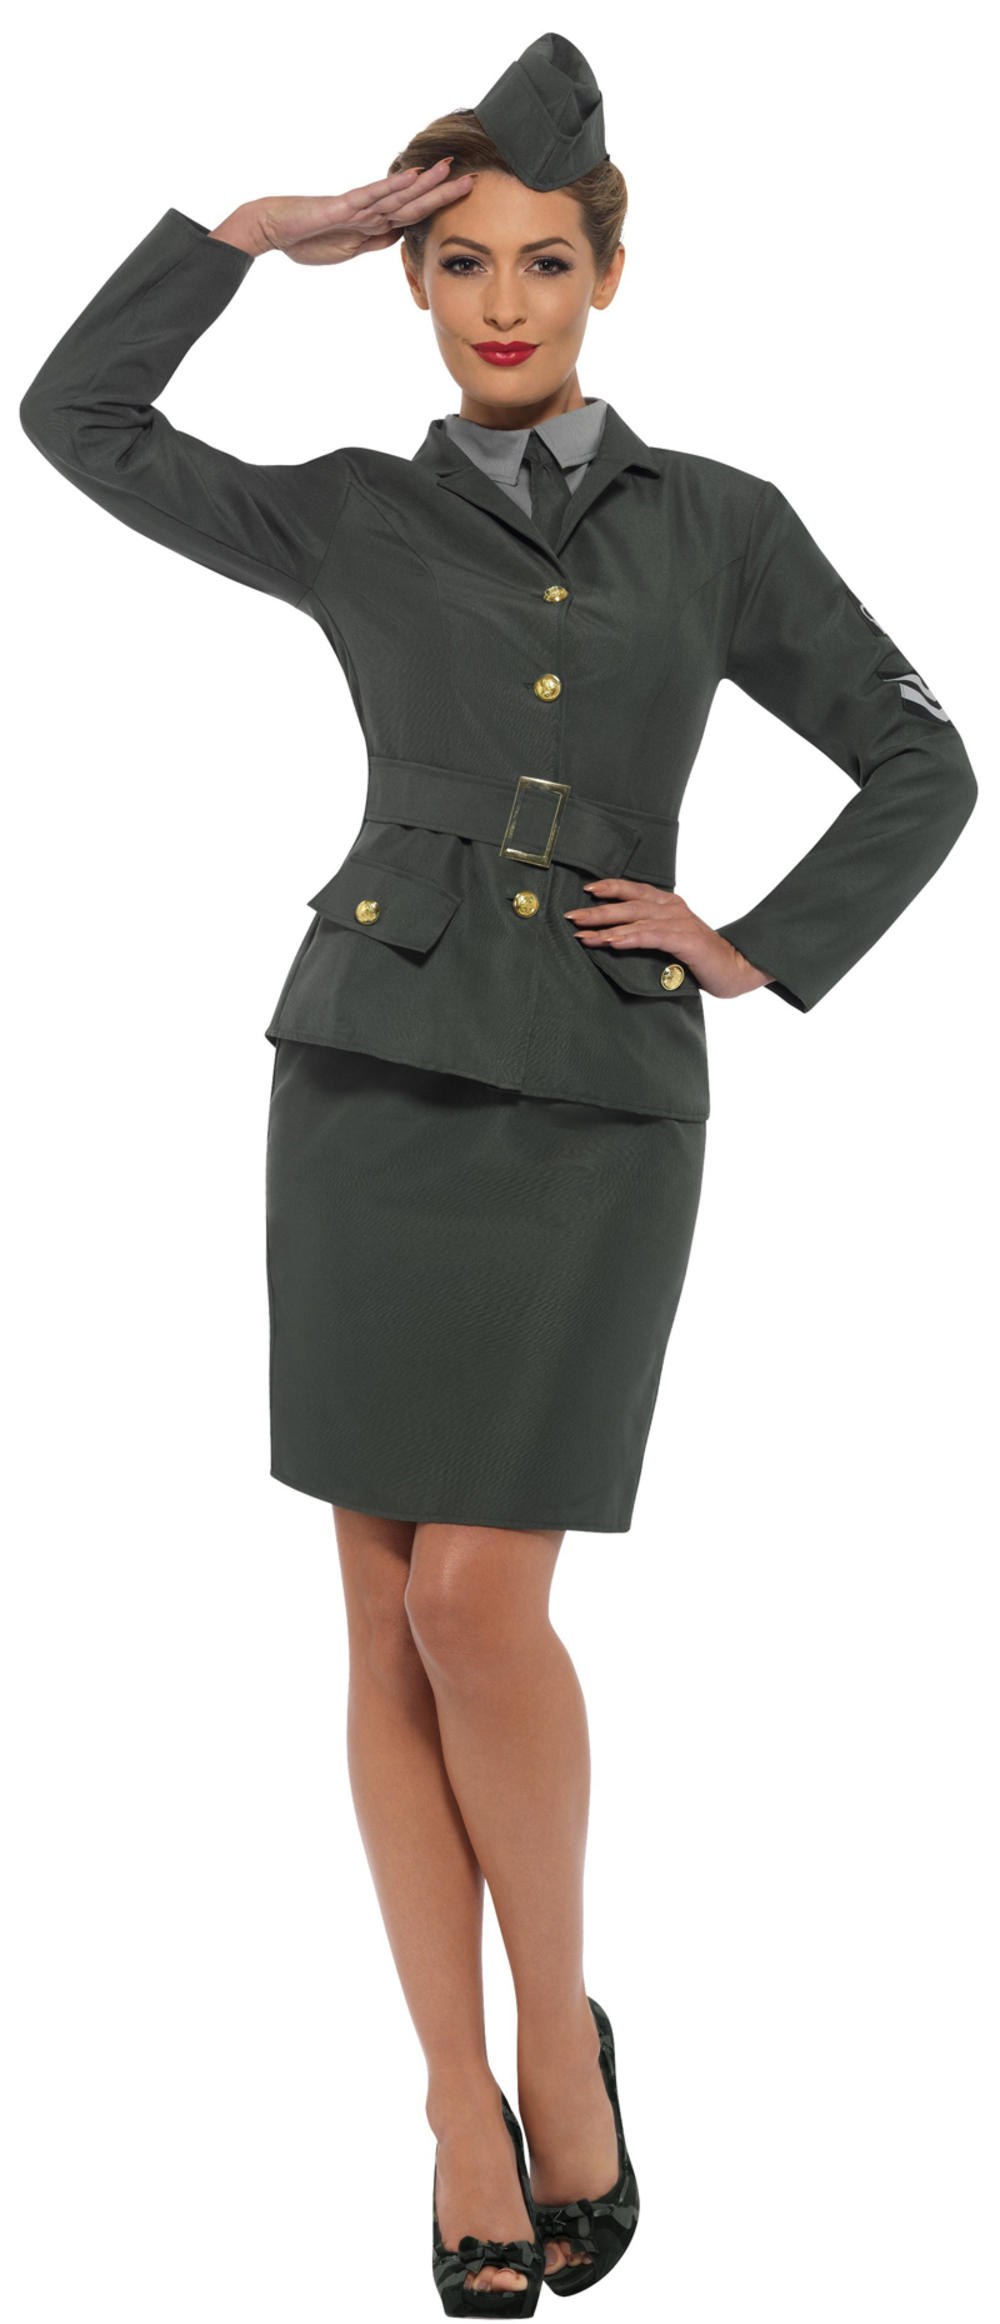 WW2 Army Girl Ladies Fancy Dress Military Soldier Uniform Womens Adults Costume